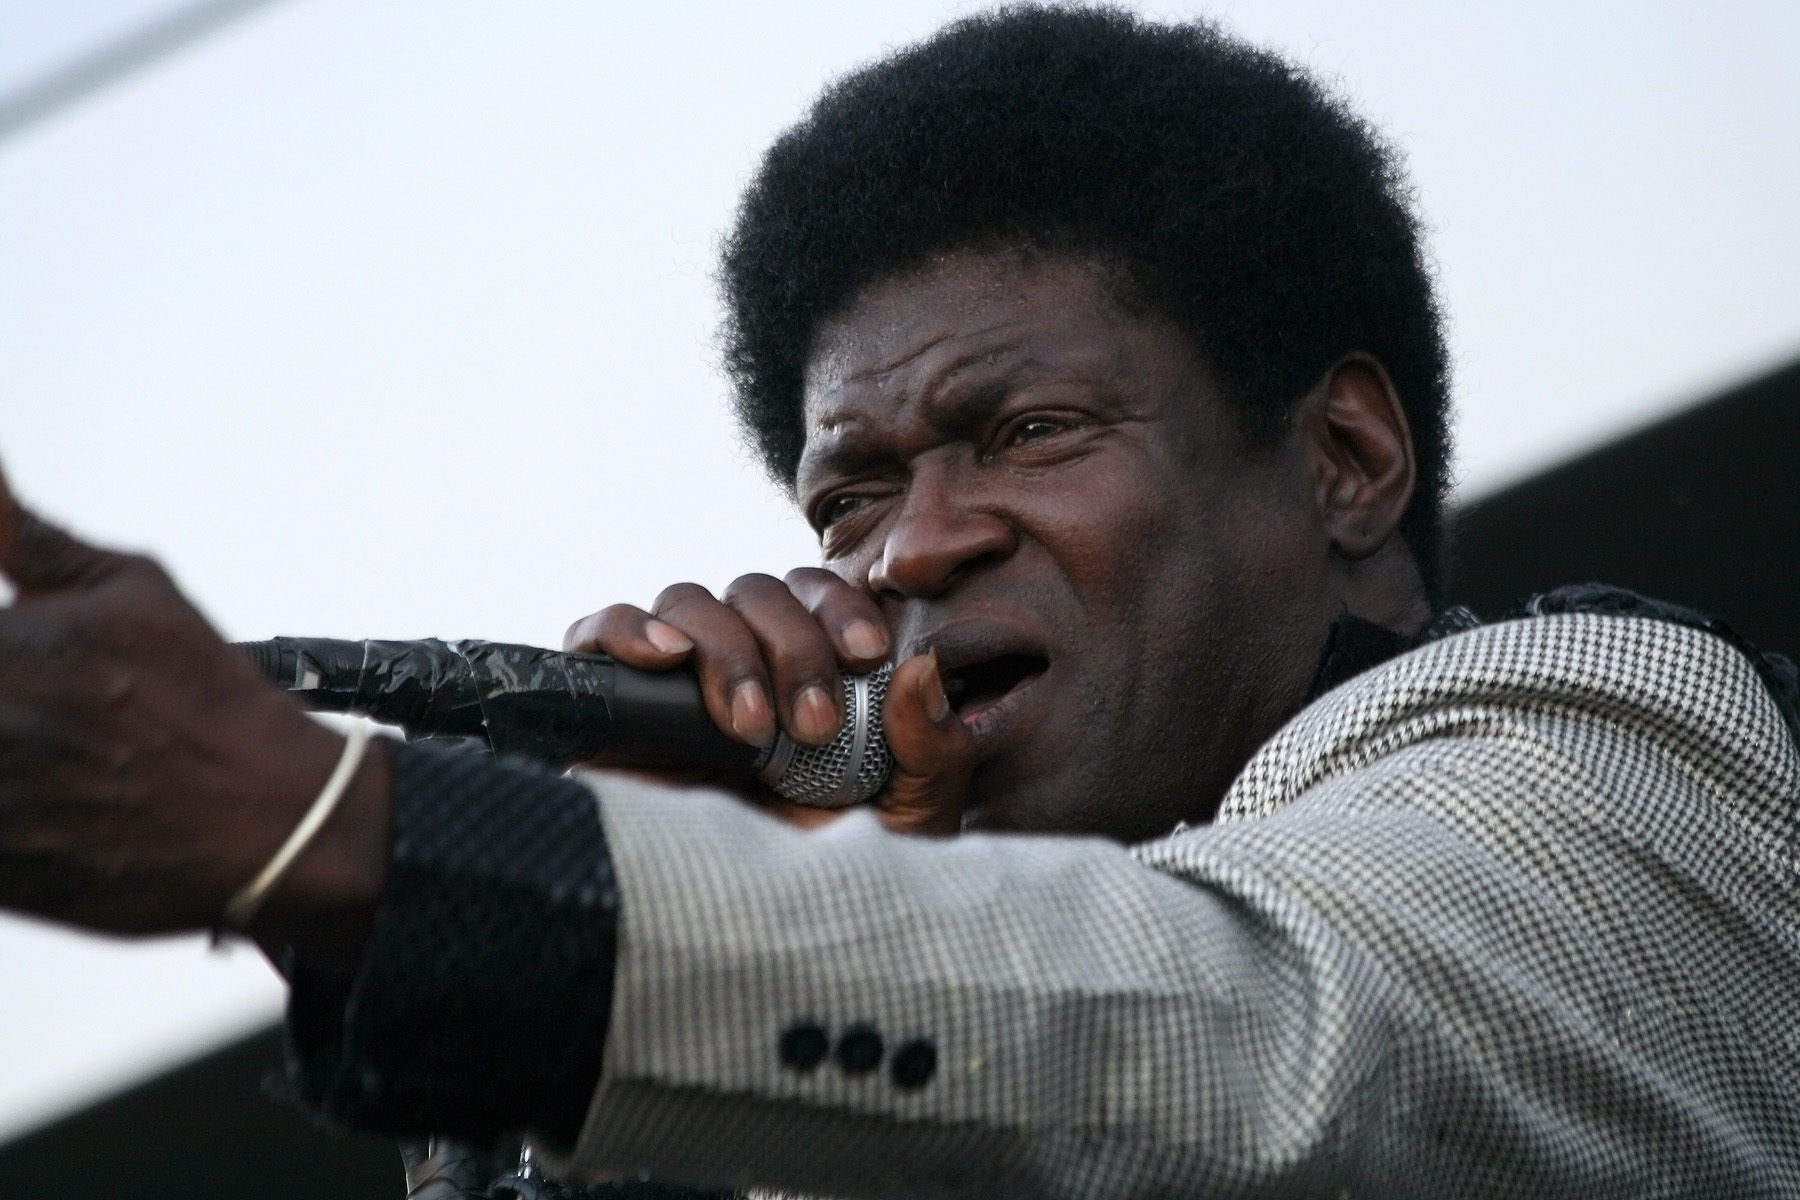 Charles bradley   the menahan street band  jazz fest wien 2011  27 nxzxe8